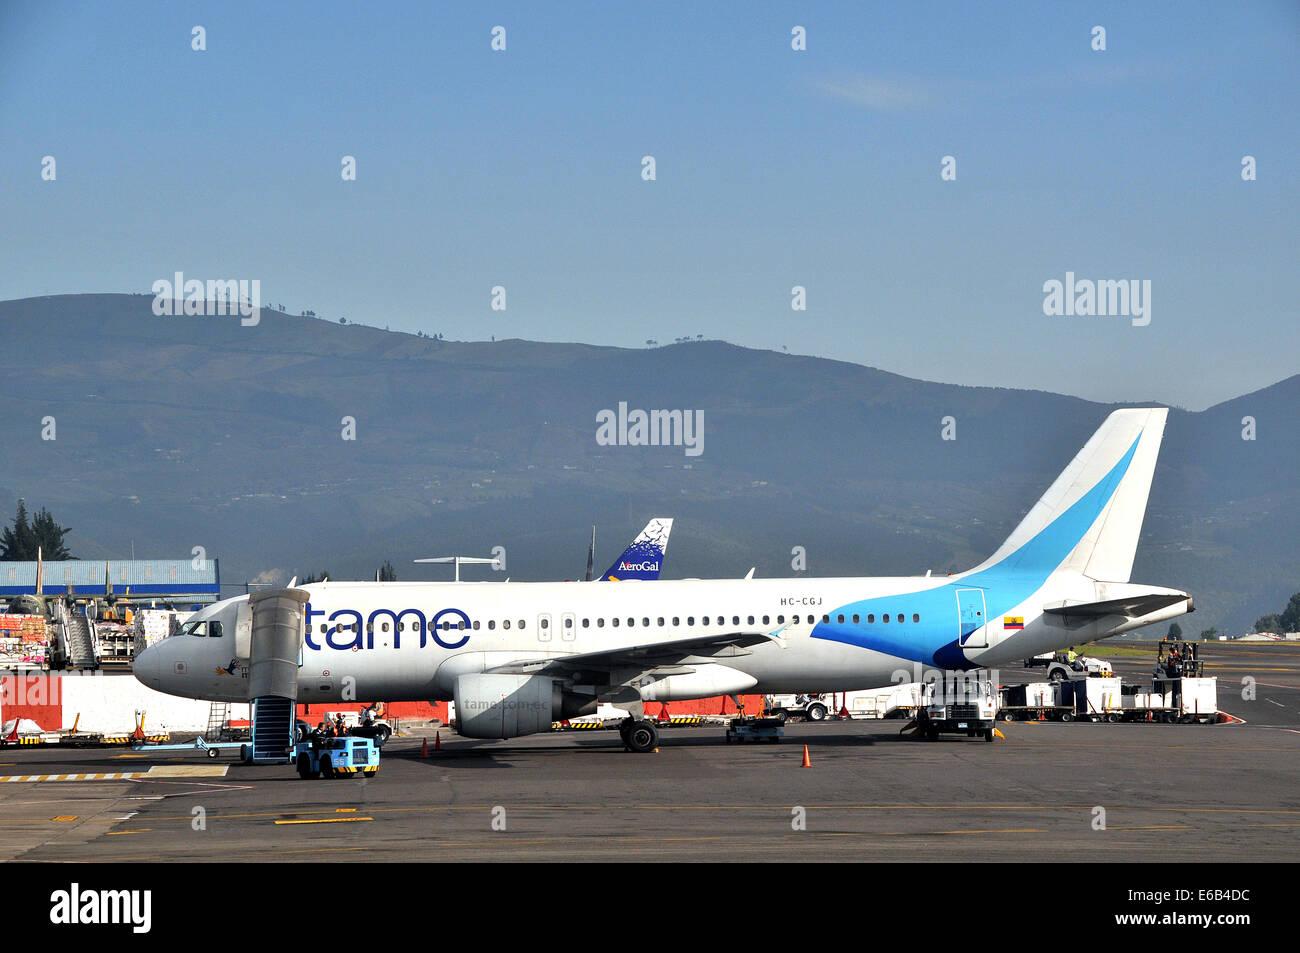 Airbus A320-214 of Tame airways  Mareshal Sucre international aiport Quito Ecuador - Stock Image